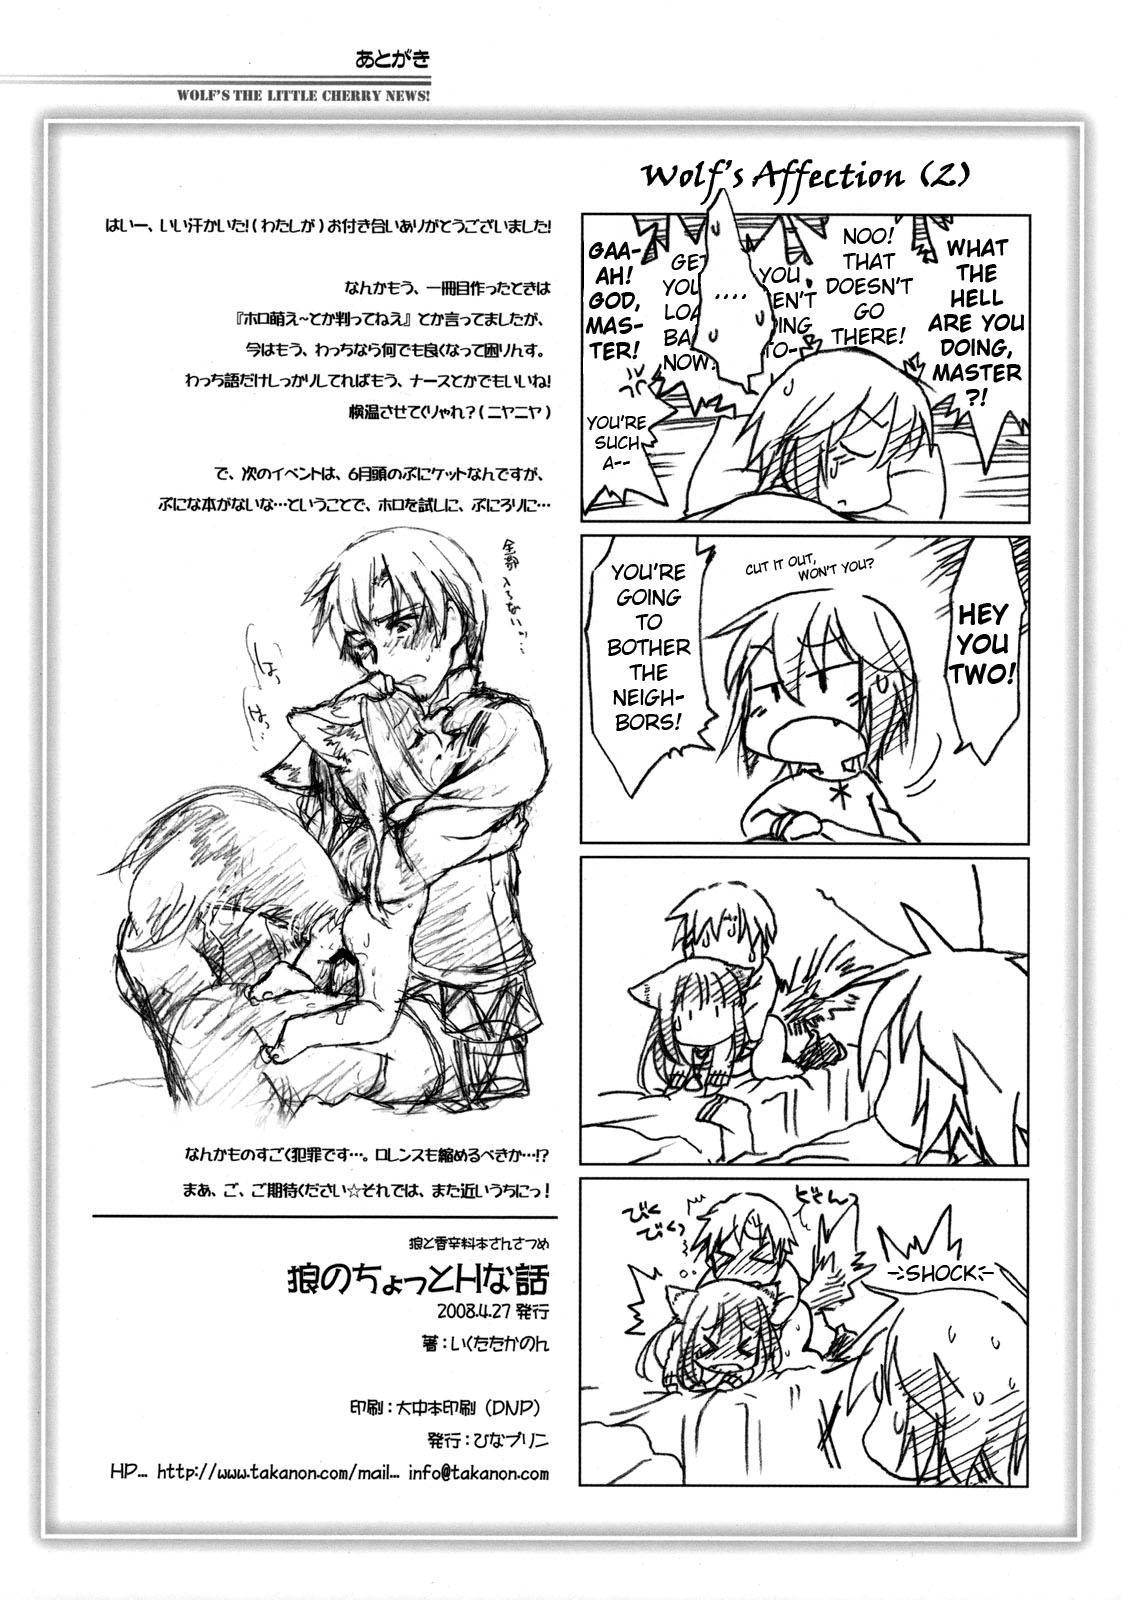 (COMIC1☆2) [Hina prin (Ikuta Takanon)] Ookami no Chotto H na Hanashi [Wolf and a Little Dirty Chat] (Ookami to Koushinryou [Spice and Wolf]) [English] ==Strange Companions== 12